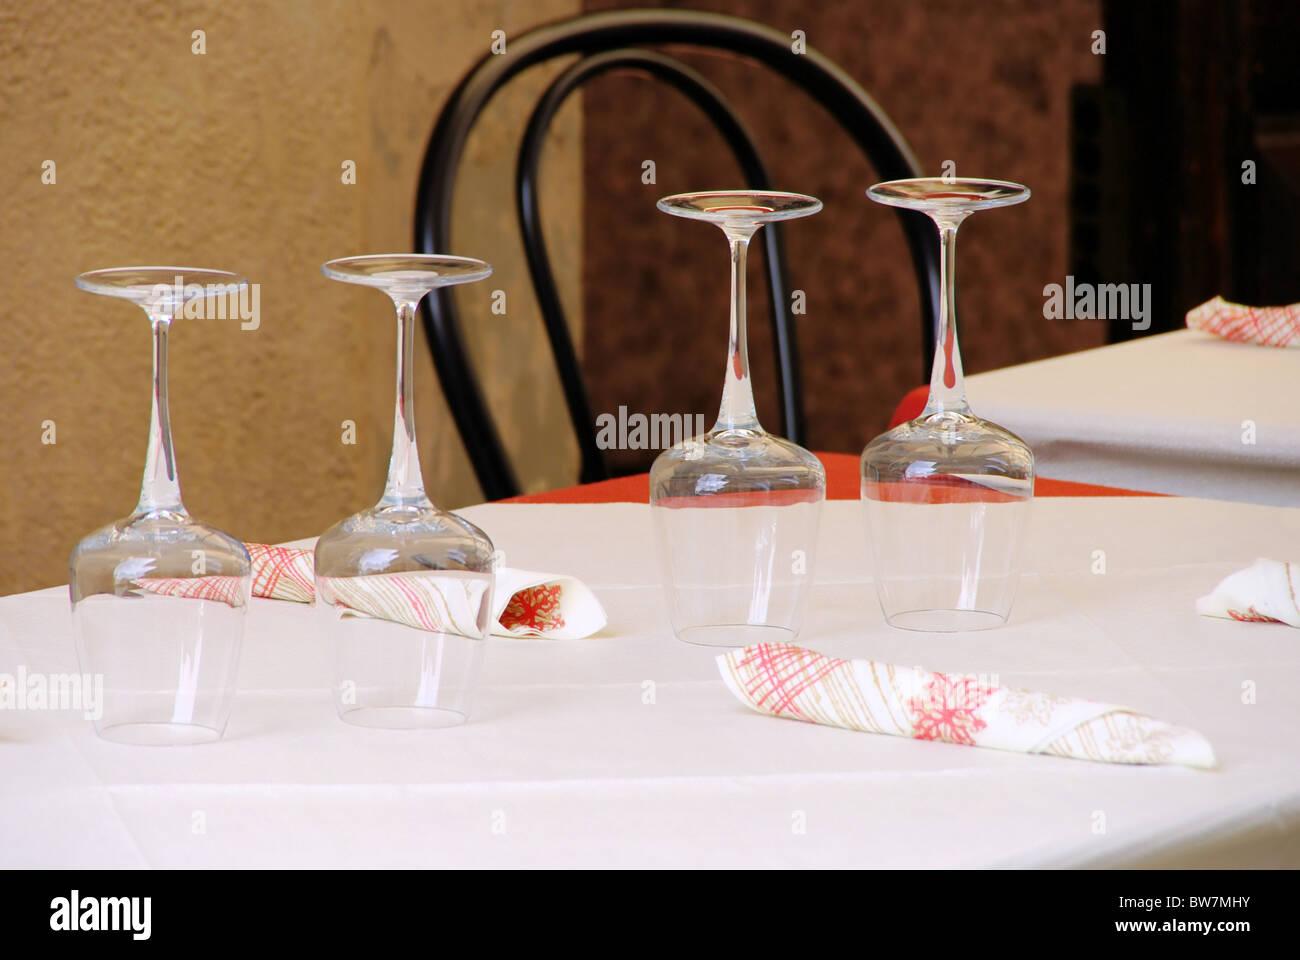 Glas auf Tisch - glass on table 01 - Stock Image